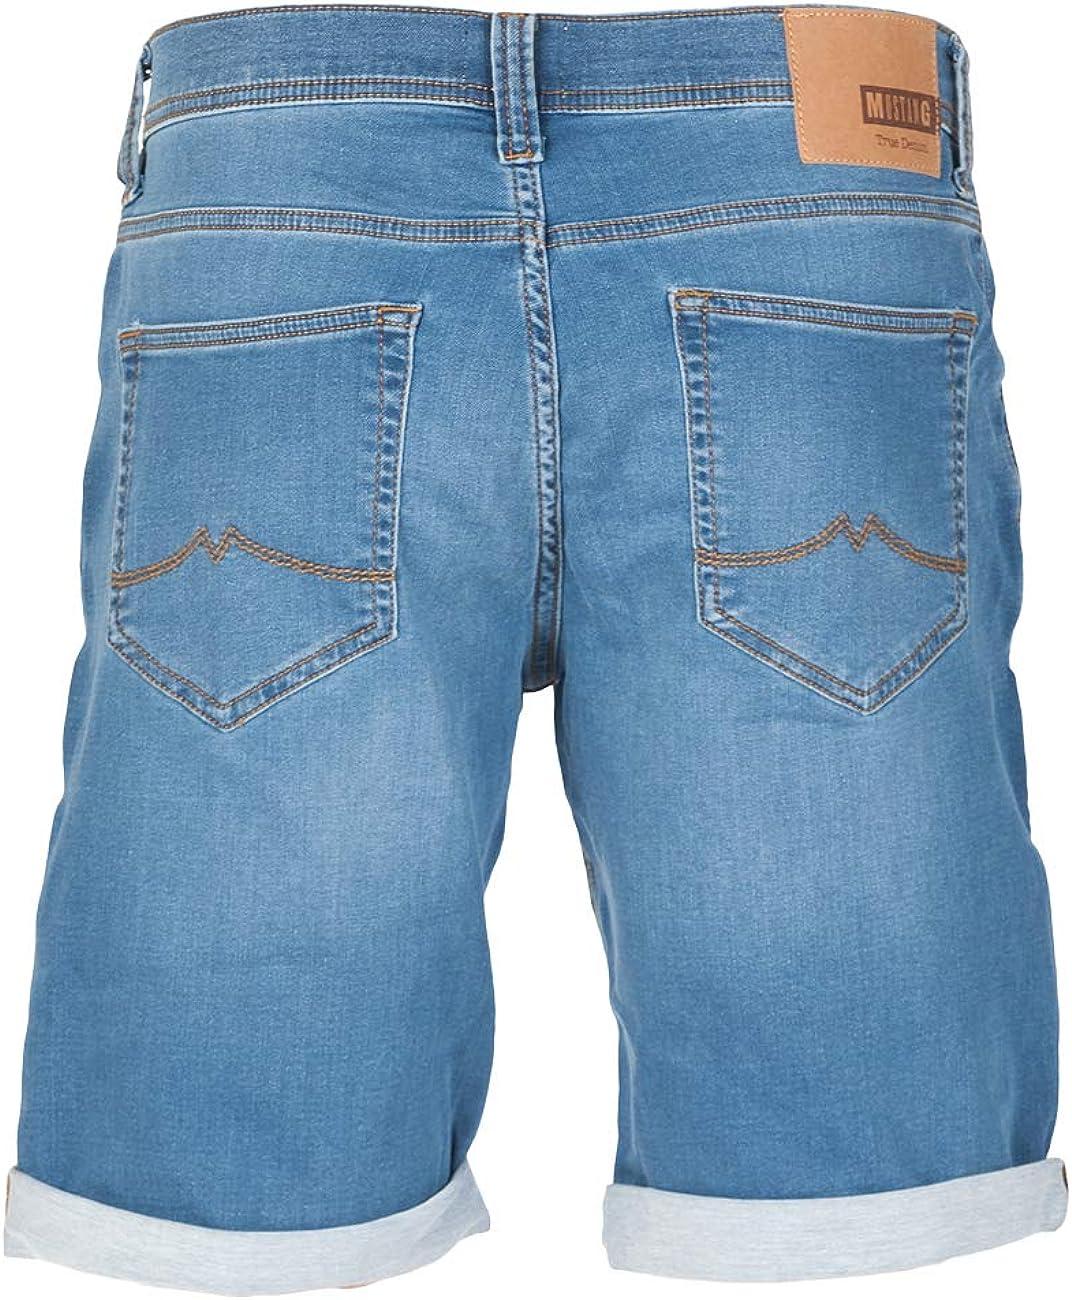 w42 MUSTANG Herren Jeans Shorts Chicago Real X Kurze Hose Sommer Bermuda Stretch Sweathose Baumwolle Grau Blau w30